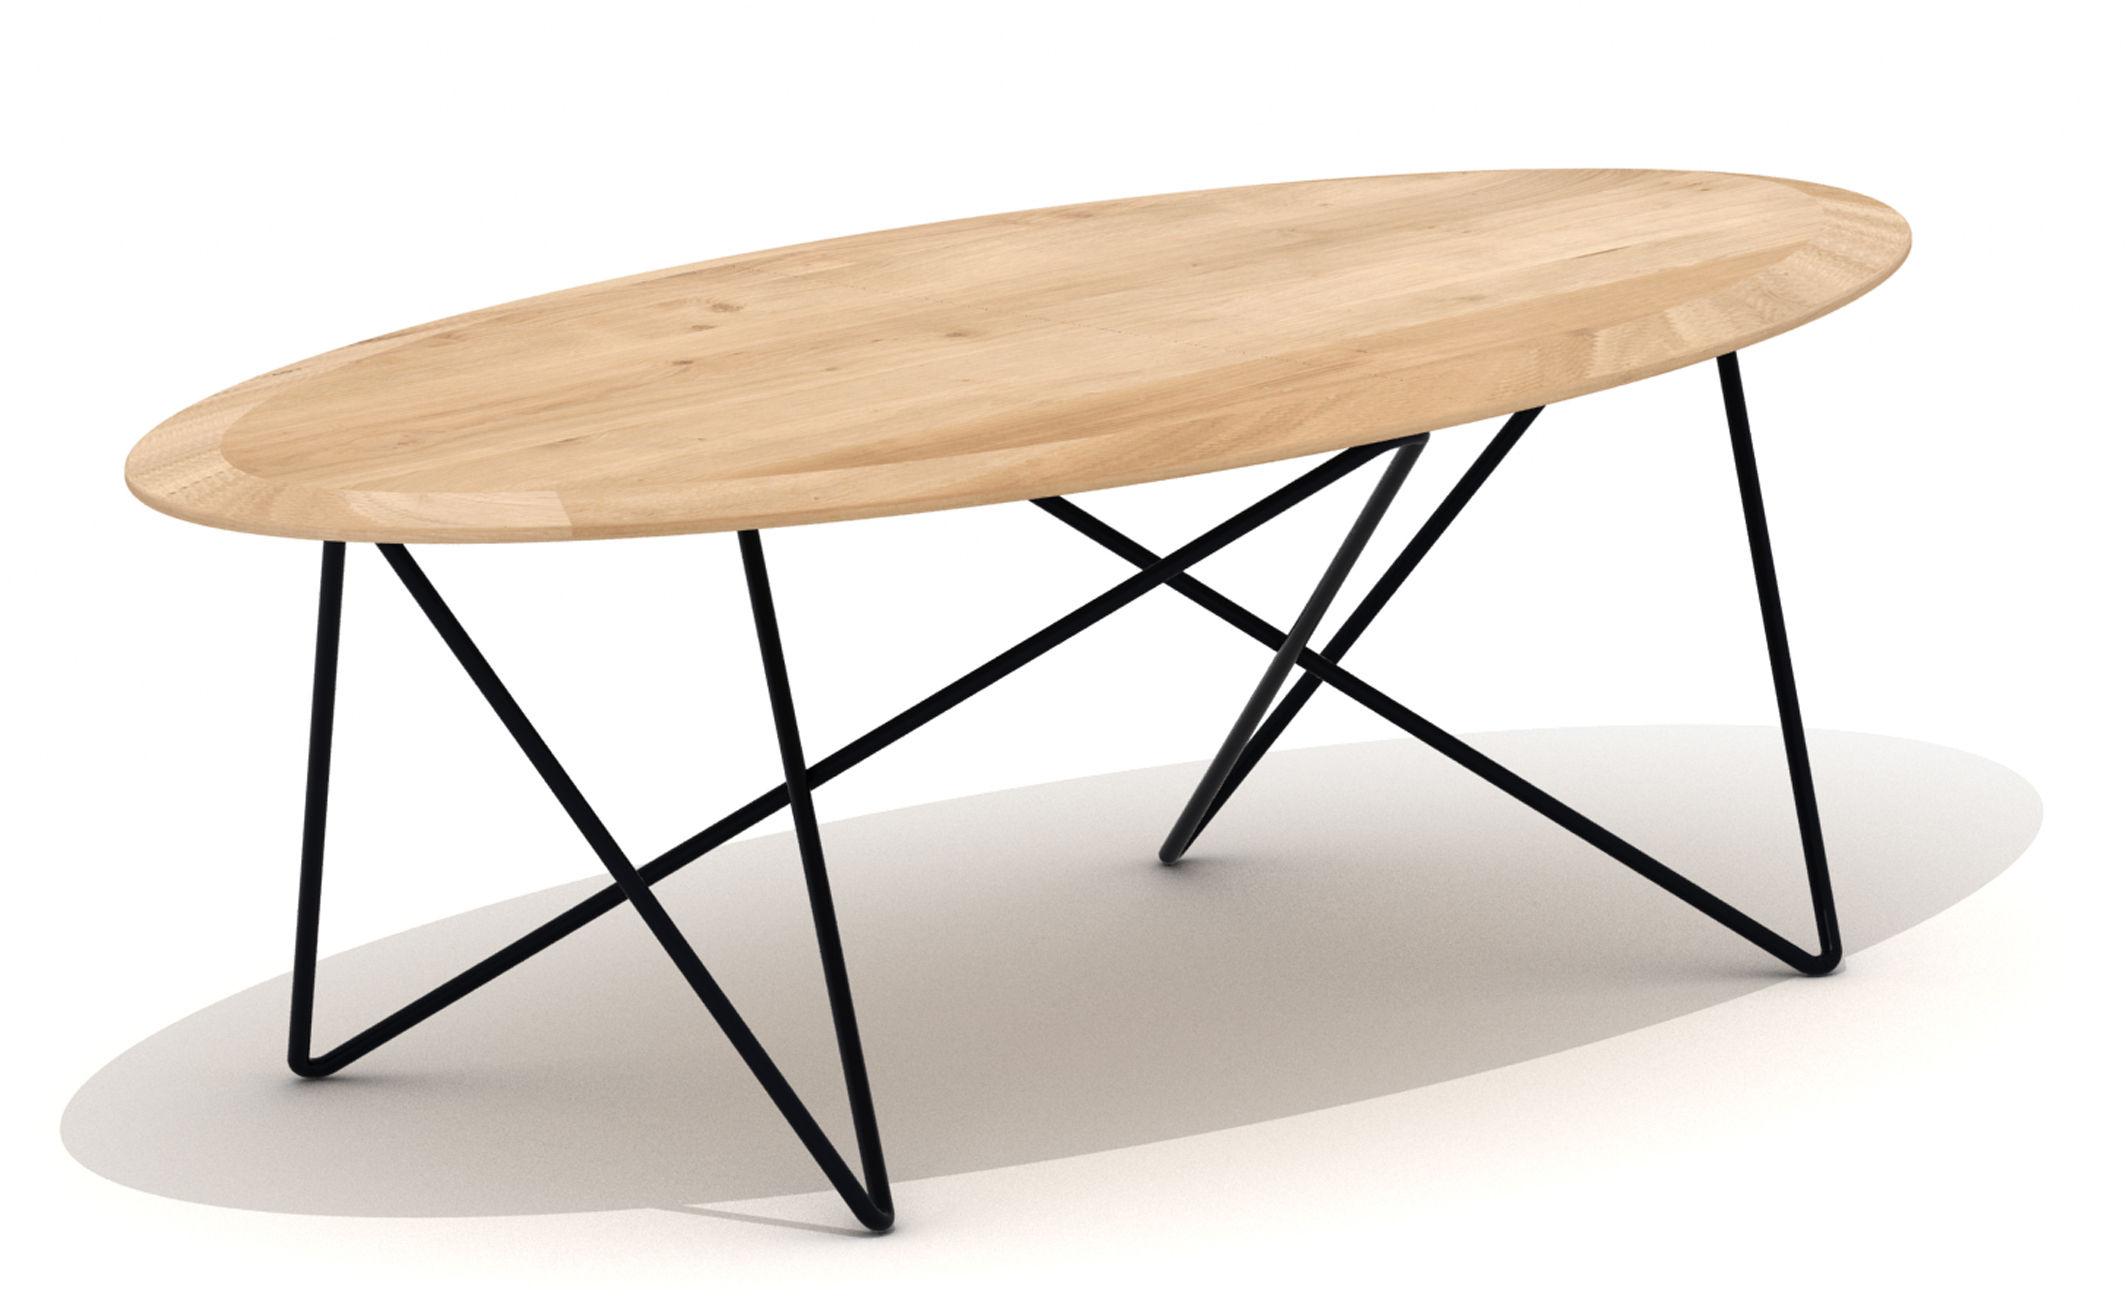 orb coffee table l 130 cm natural wood black leg by universo positivo. Black Bedroom Furniture Sets. Home Design Ideas